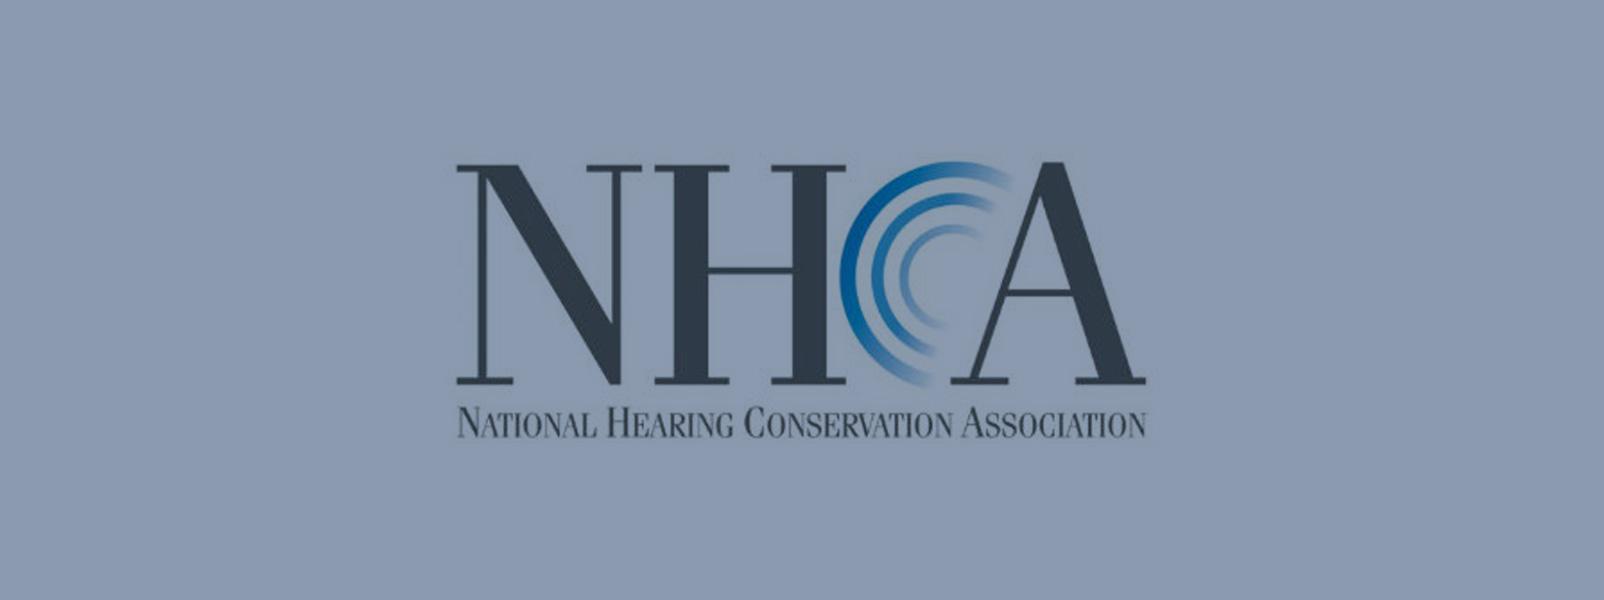 National Hearing Conservation Association: Suppressors An Important Hearing Conservation Tool